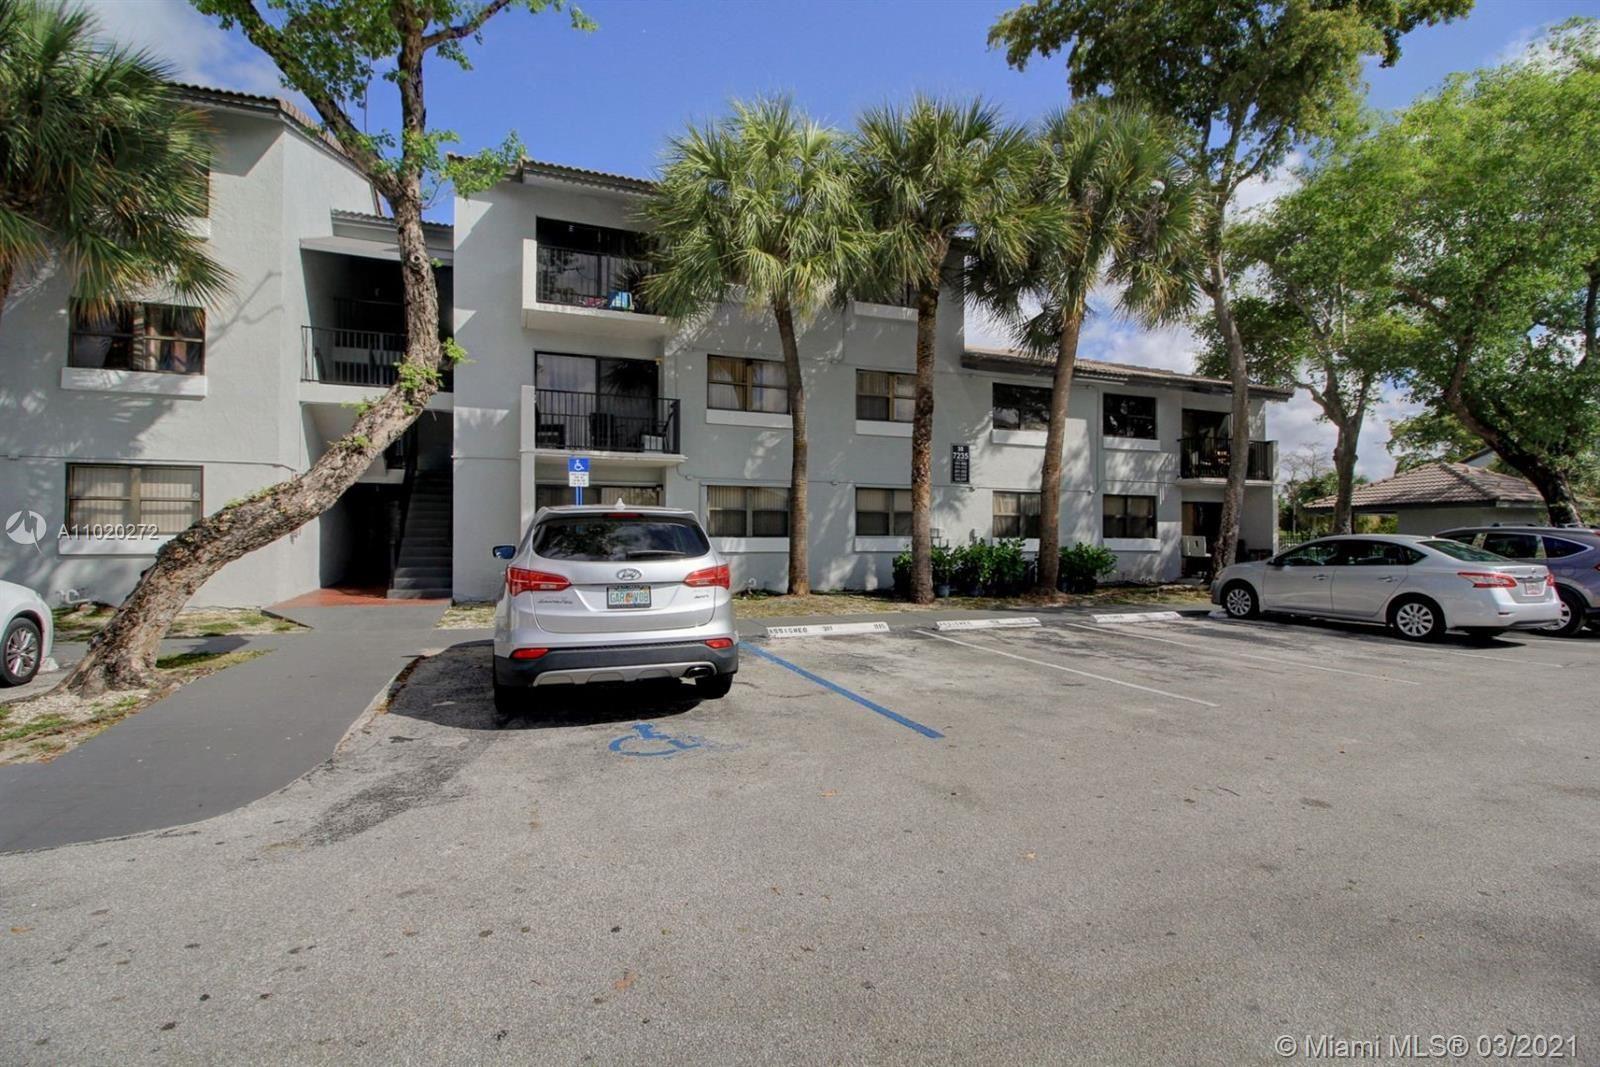 7235 NW 179 Street #311, Hialeah, FL 33015 - #: A11020272